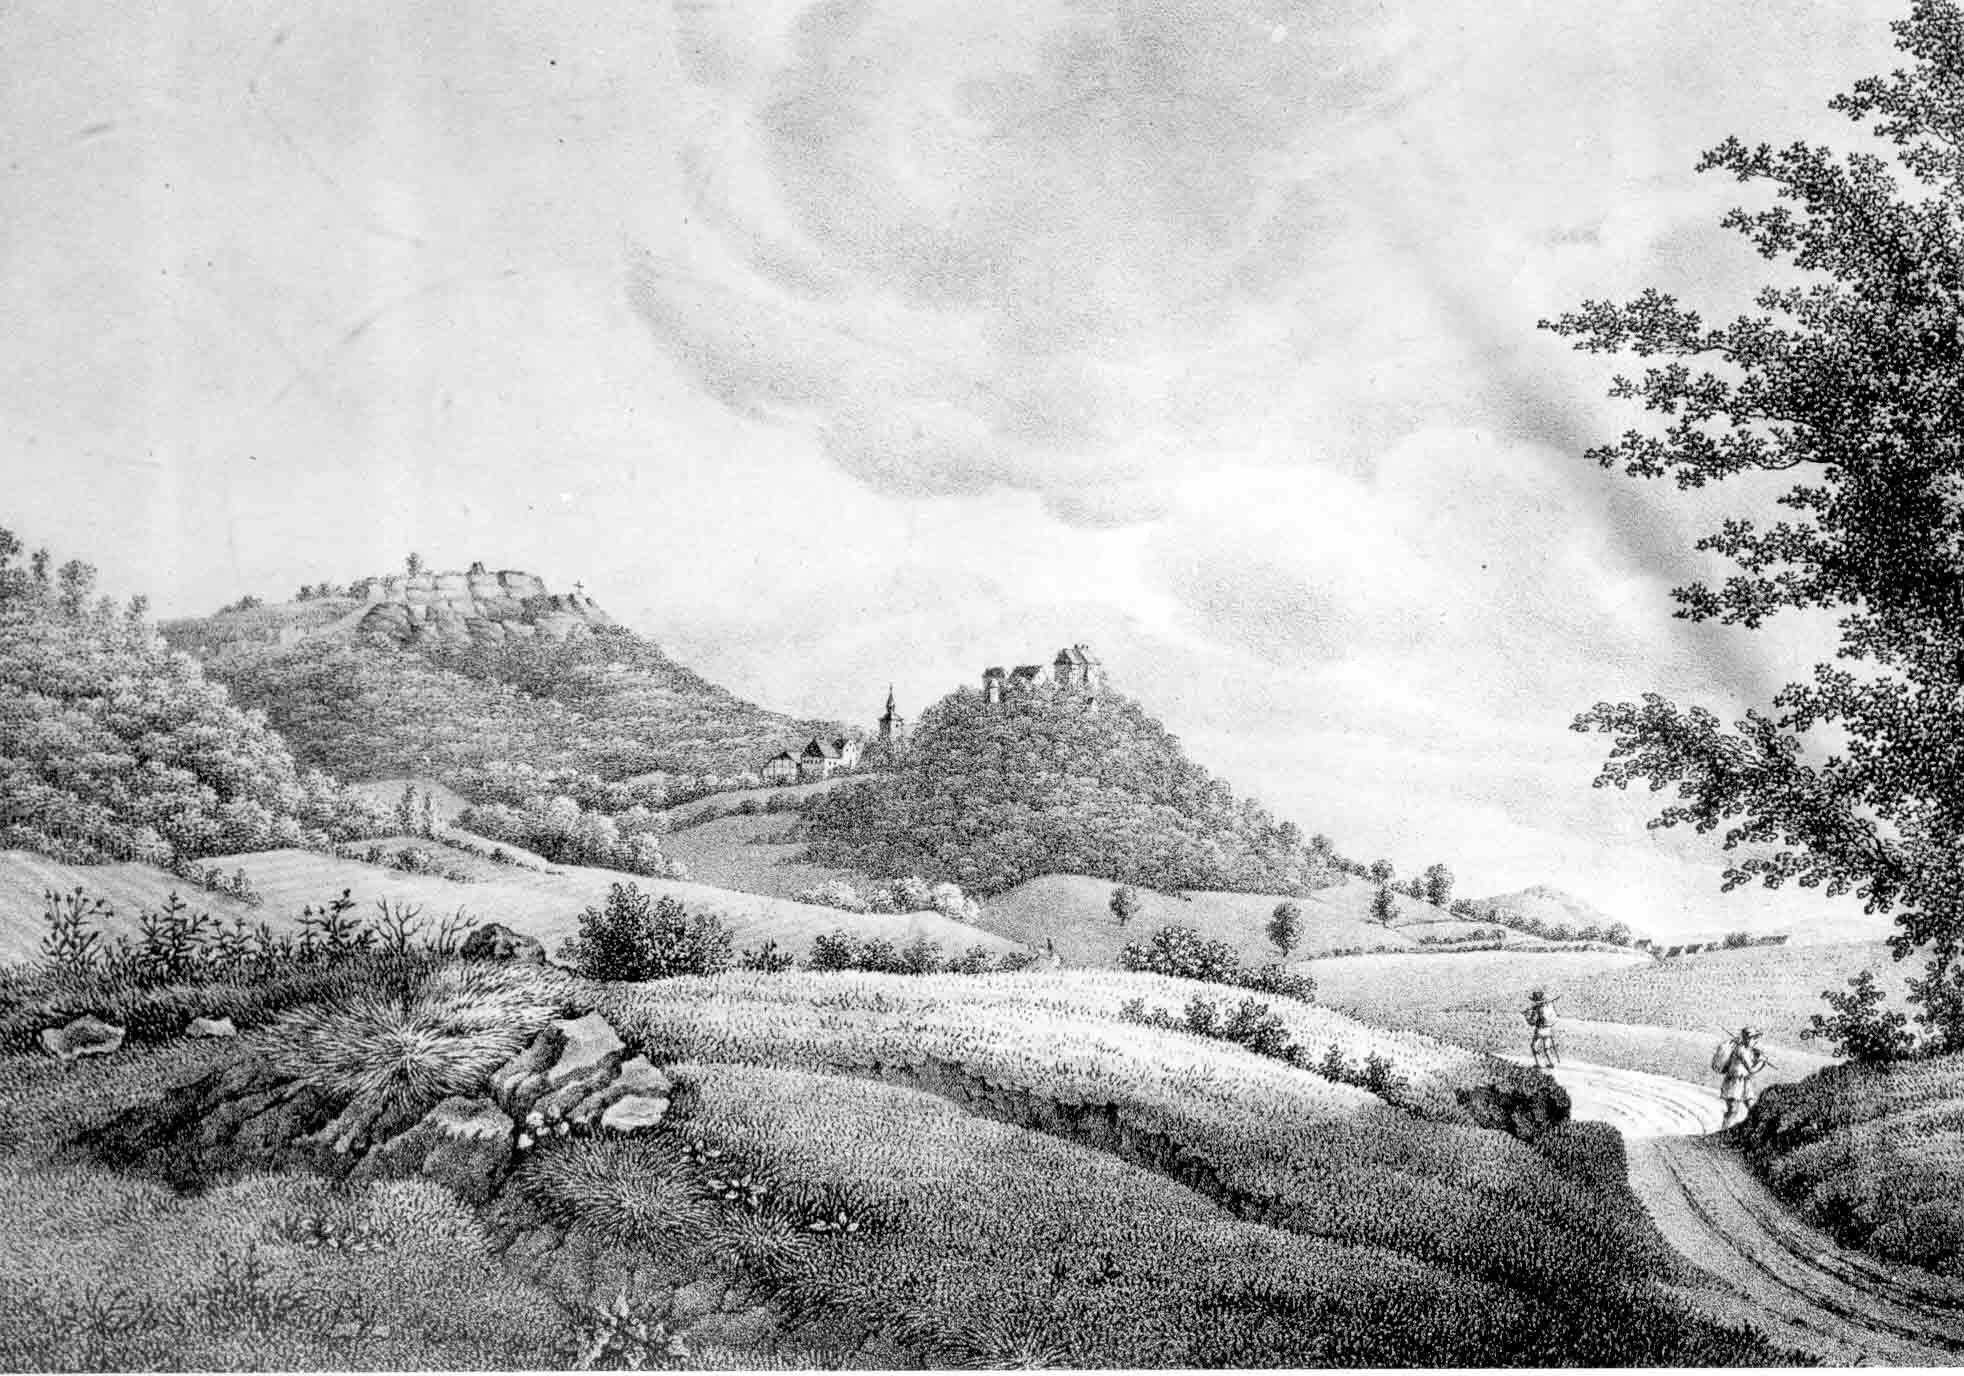 Schaumburg bei Rinteln um 1830